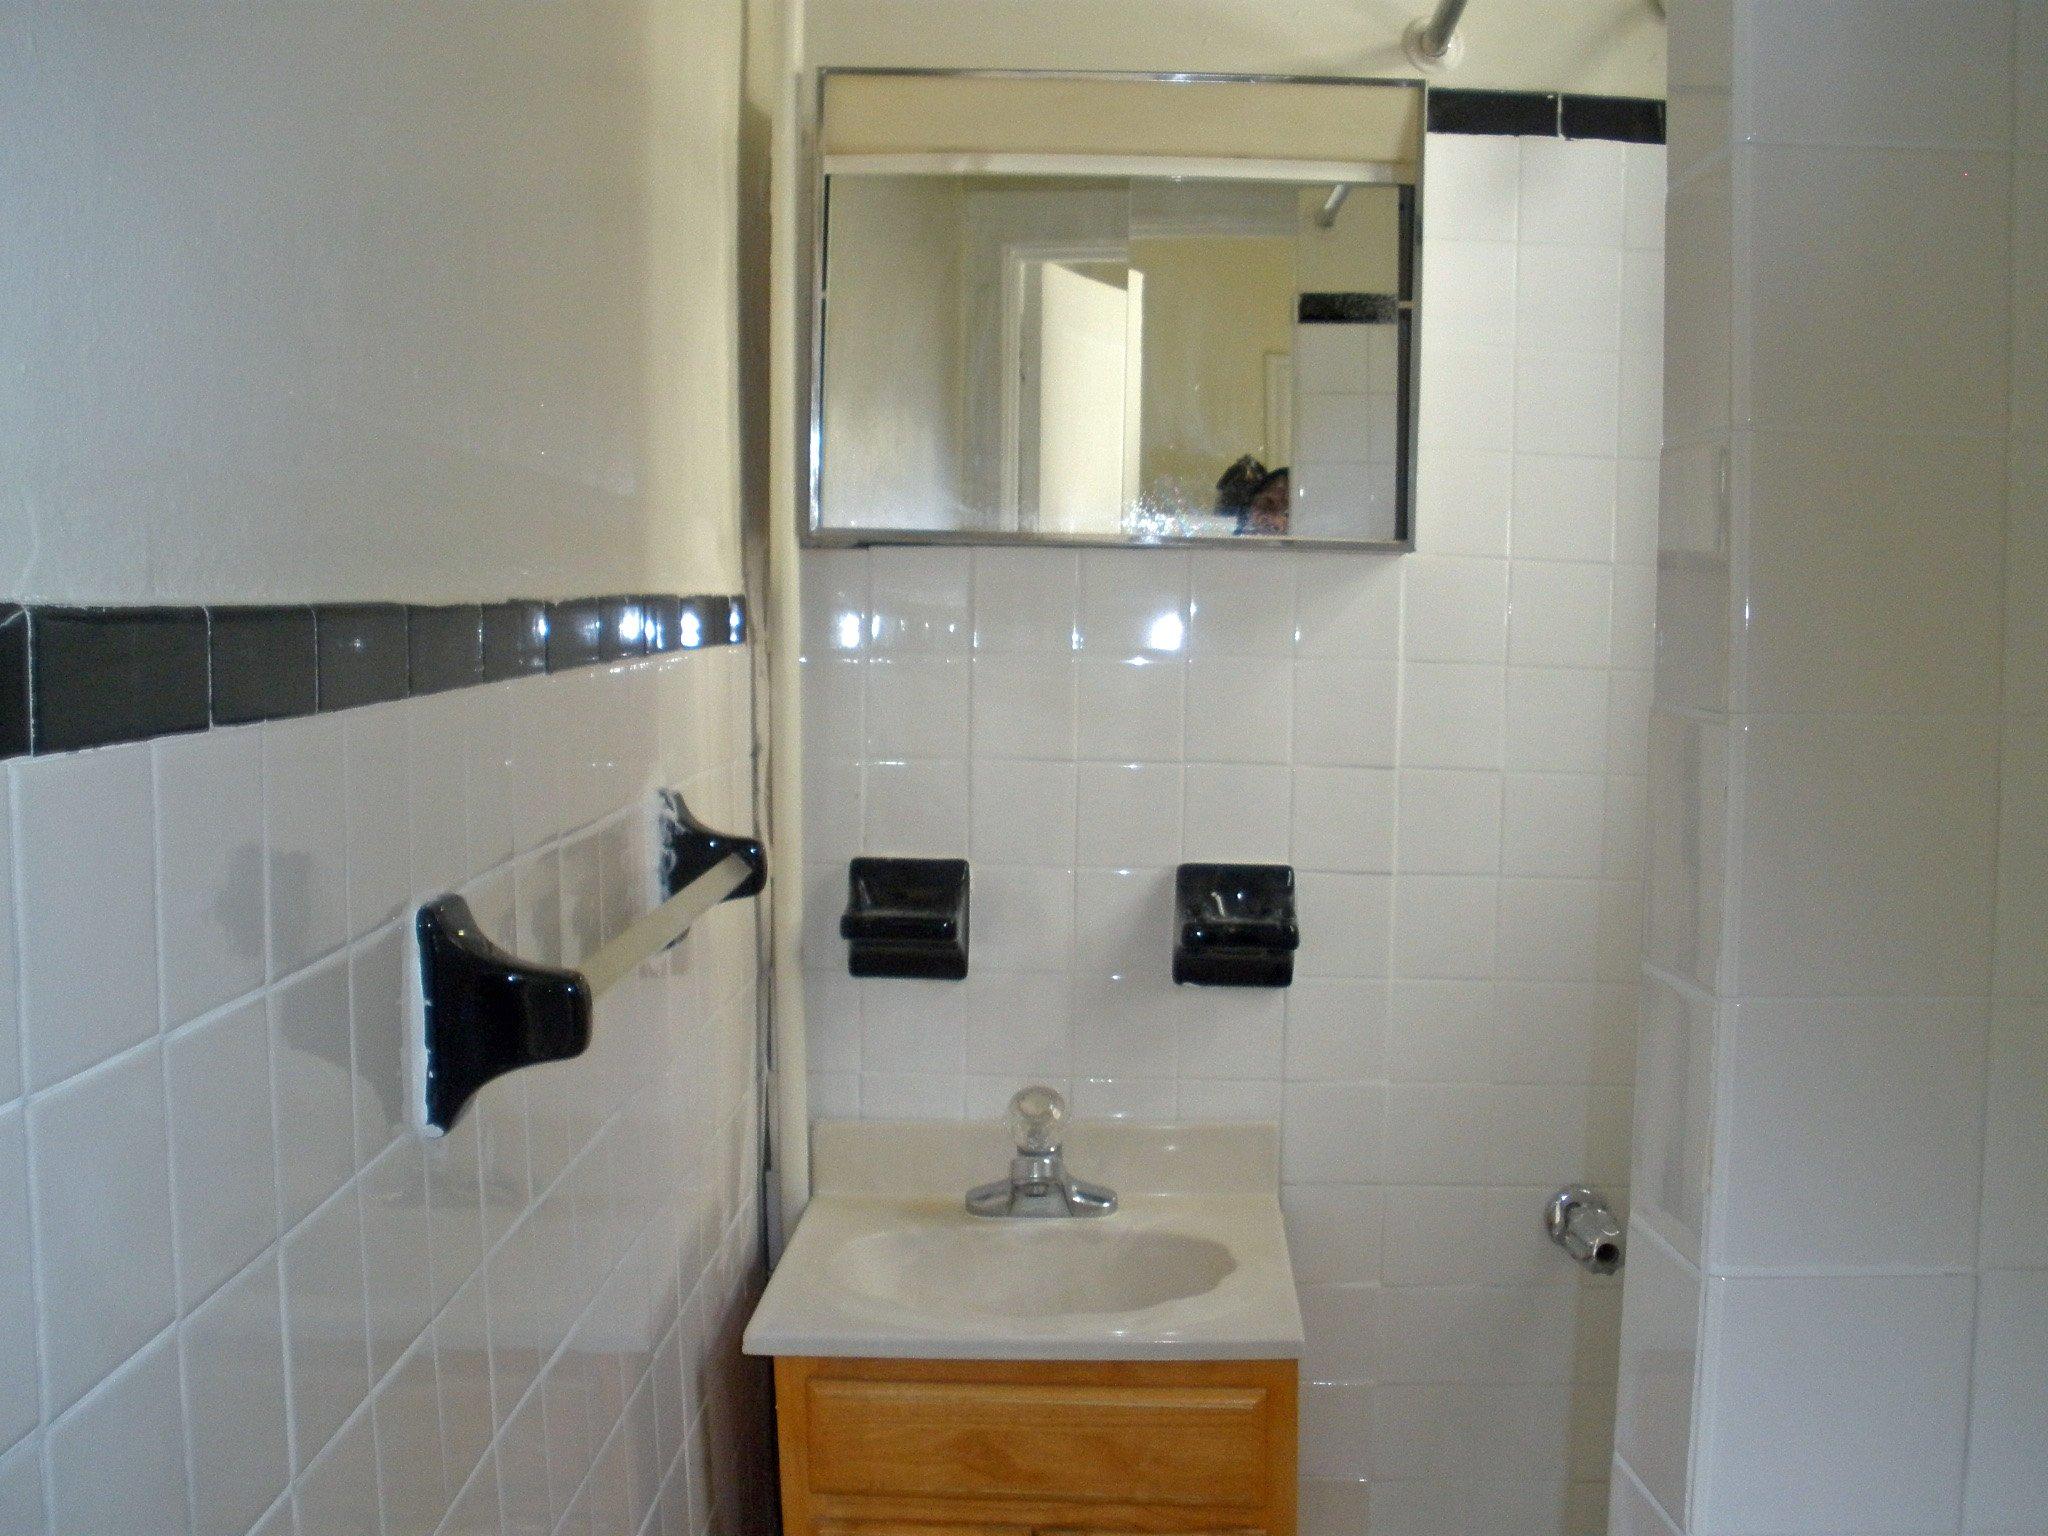 Section 8 4 Bedroom Voucher East Flatbush 1 Bedroom Apartment For Rent Brooklyn Crg3089